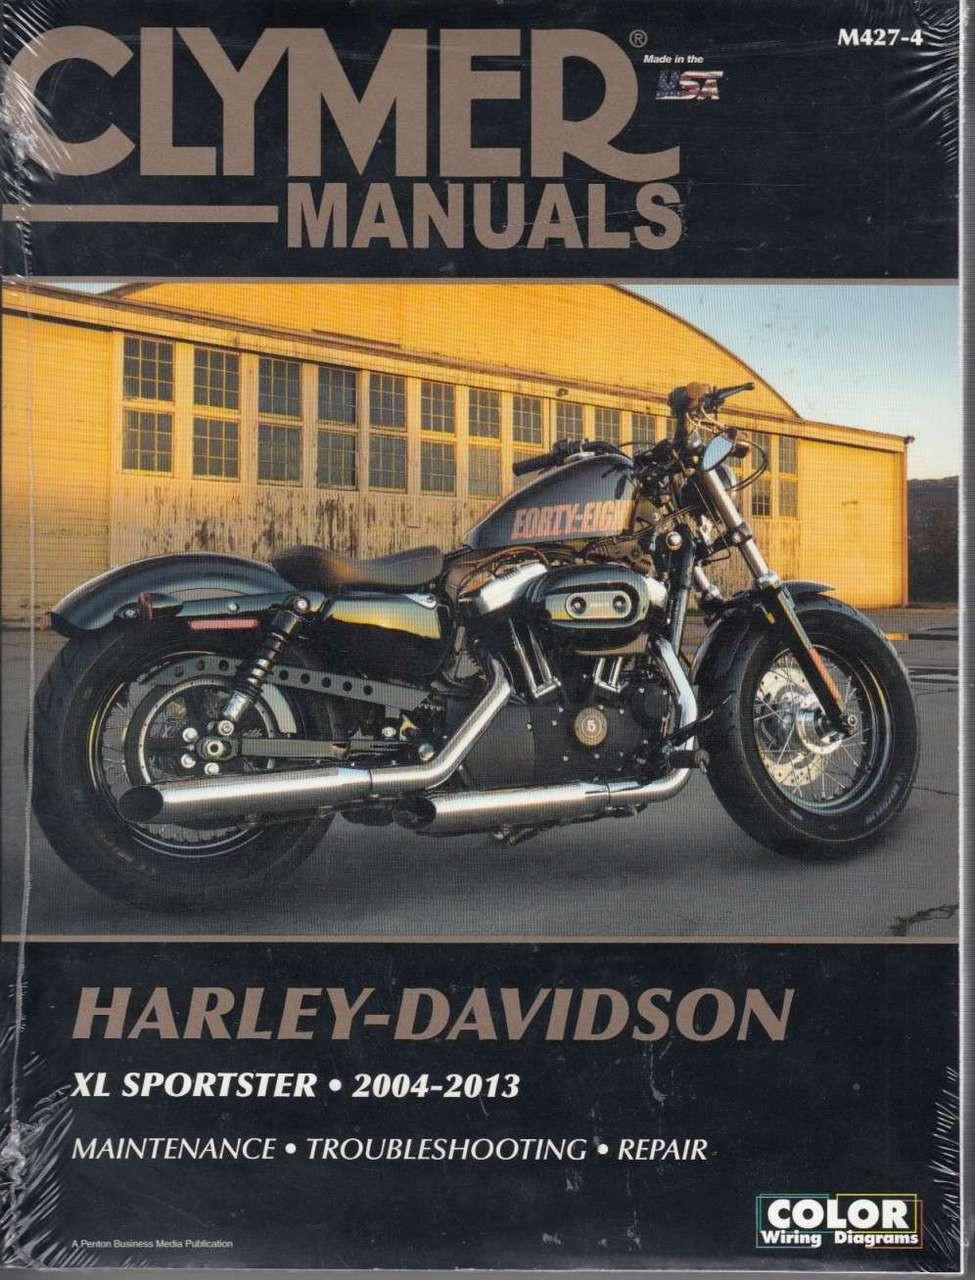 2015 sportster xlh 883 repair manual rh signaturepedagogies org uk 2007 harley davidson sportster 883 harley davidson sportster 883 [ 975 x 1280 Pixel ]